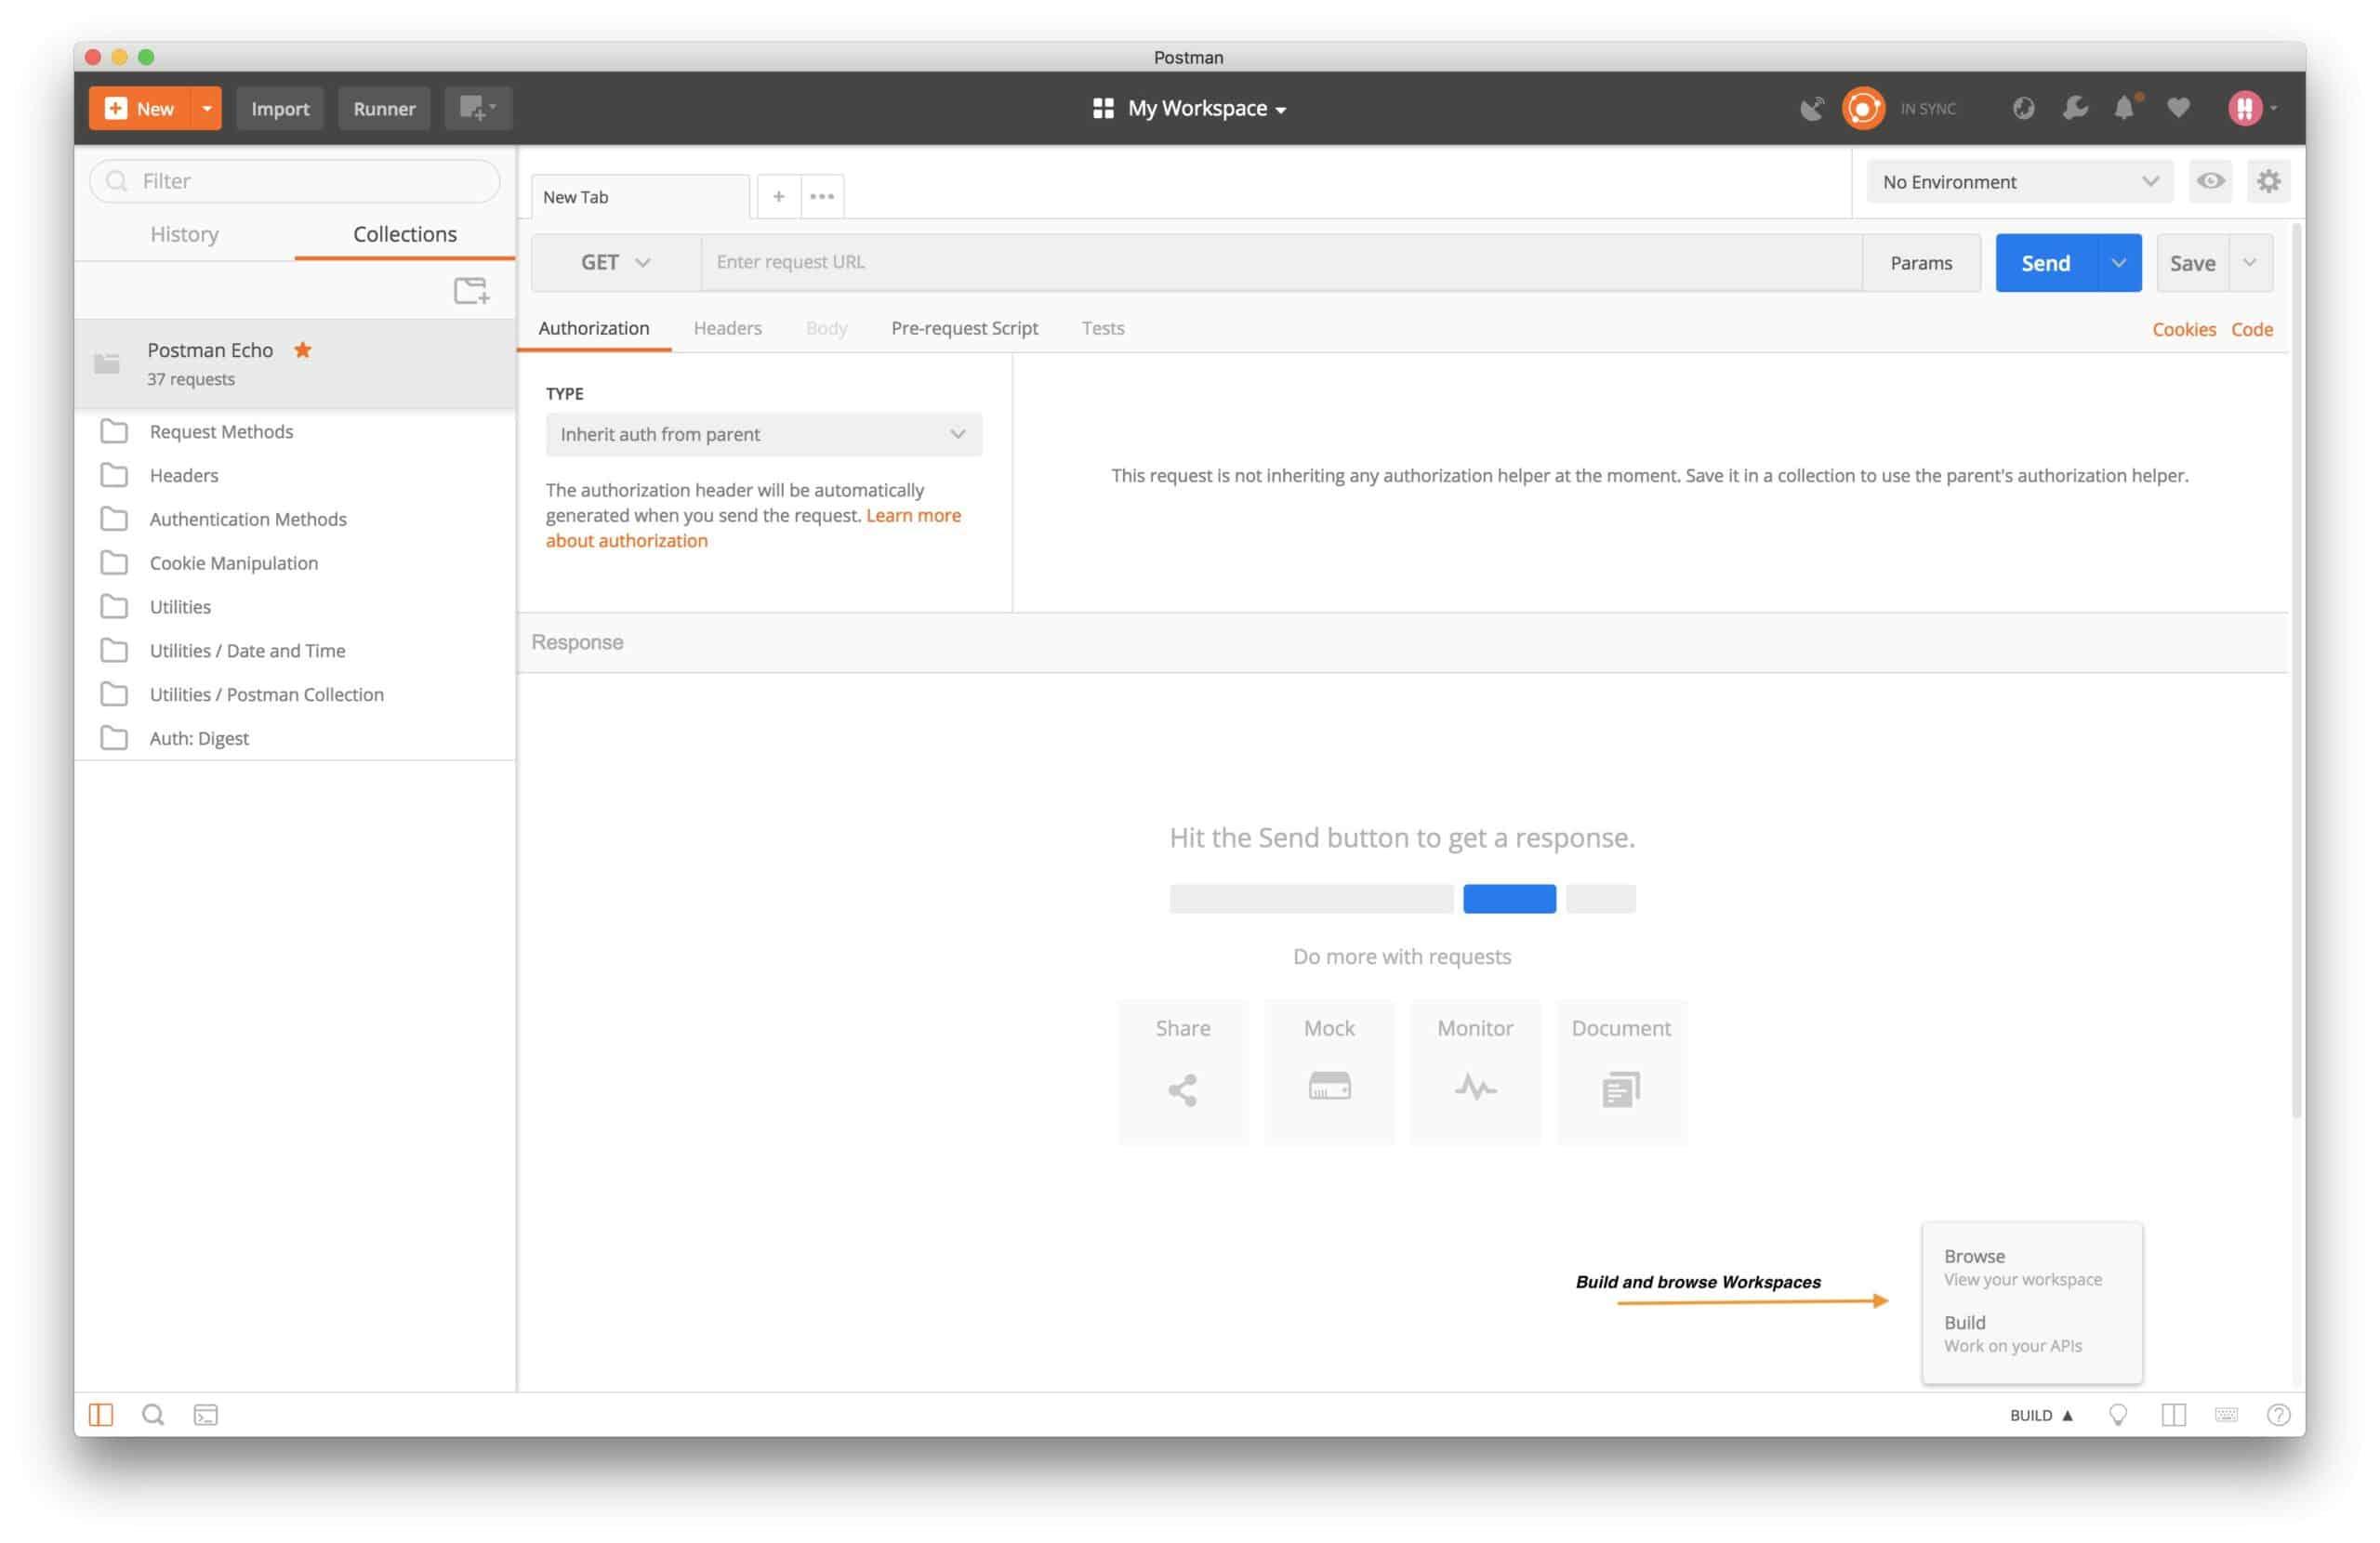 Postman WS-appView-build-menu